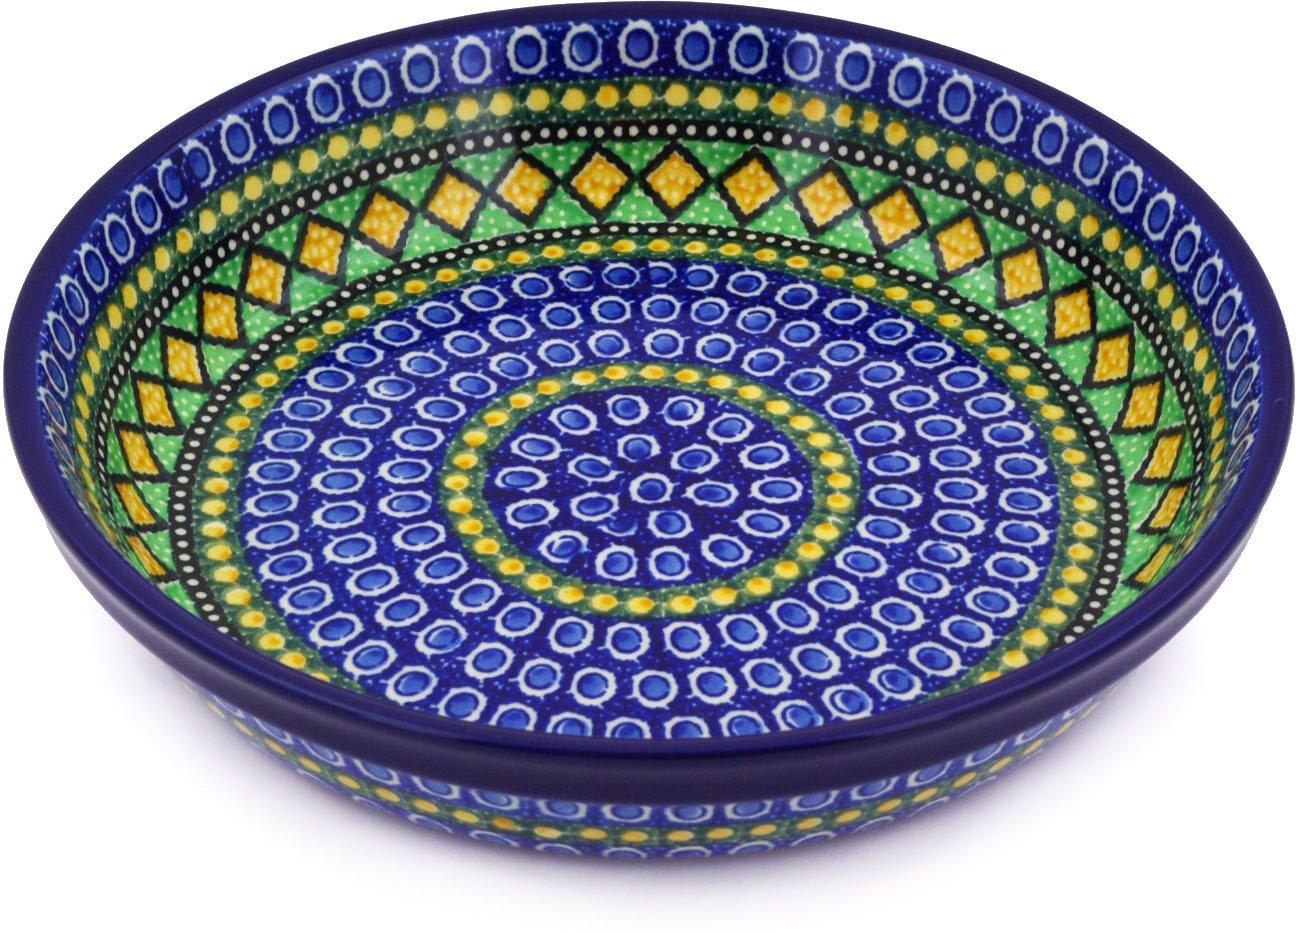 Polish Pottery Pie Dish 10-inch Stained Glass Window UNIKAT